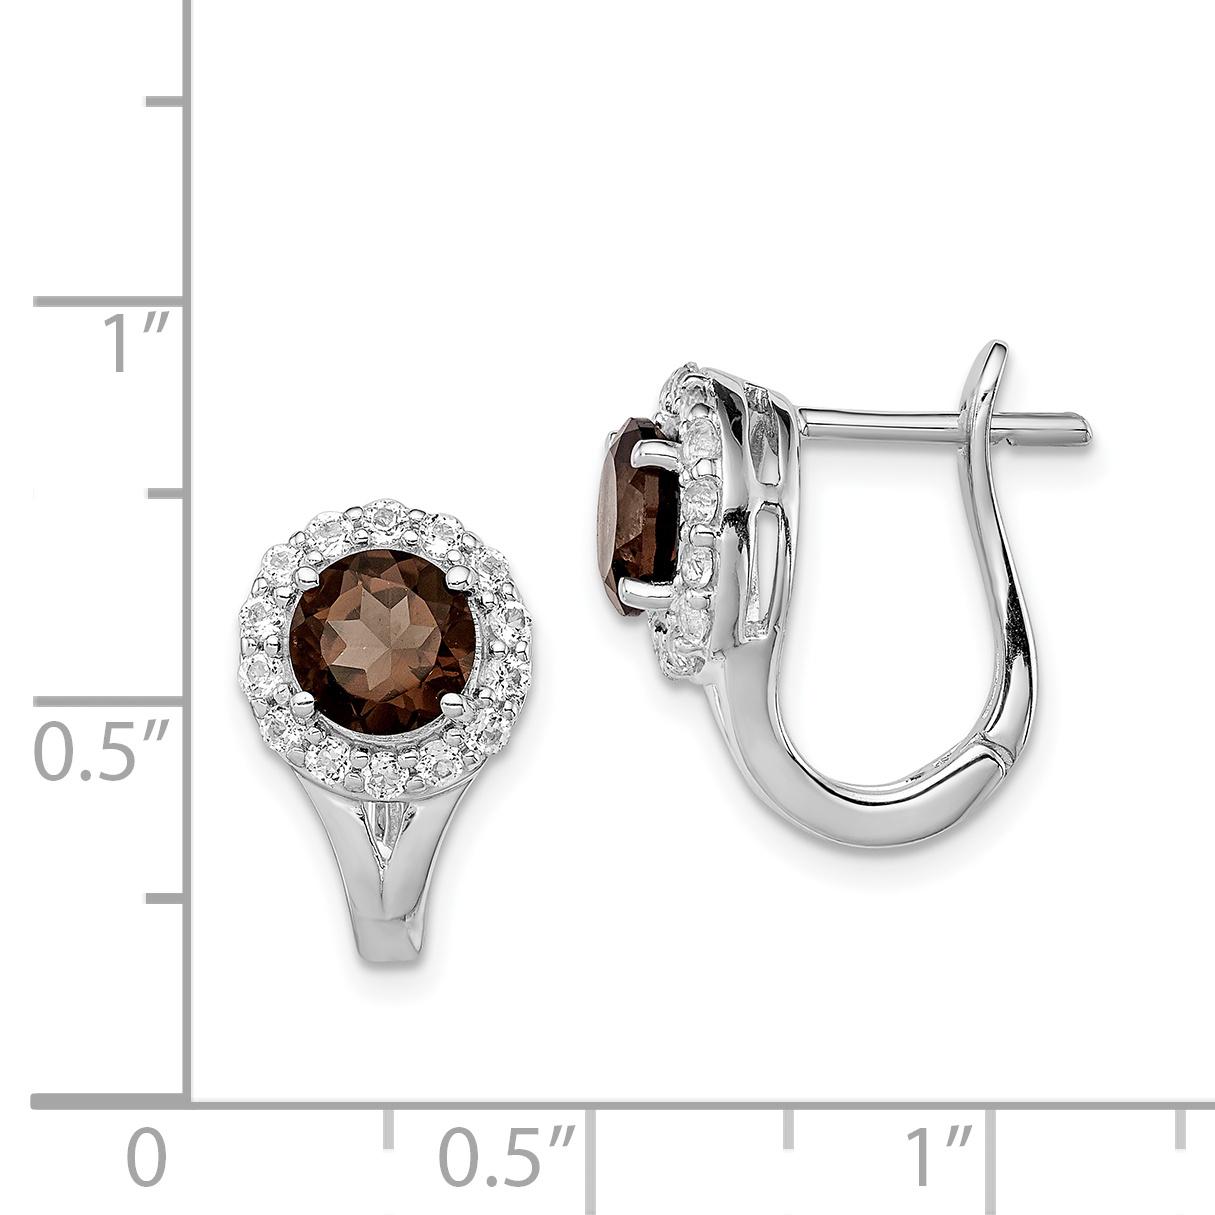 925 Sterling Silver White Topaz Smoky Quartz Hinged Hoop Earrings Ear Hoops Set Drop Dangle Fine Jewelry Gifts For Women For Her - image 1 de 2